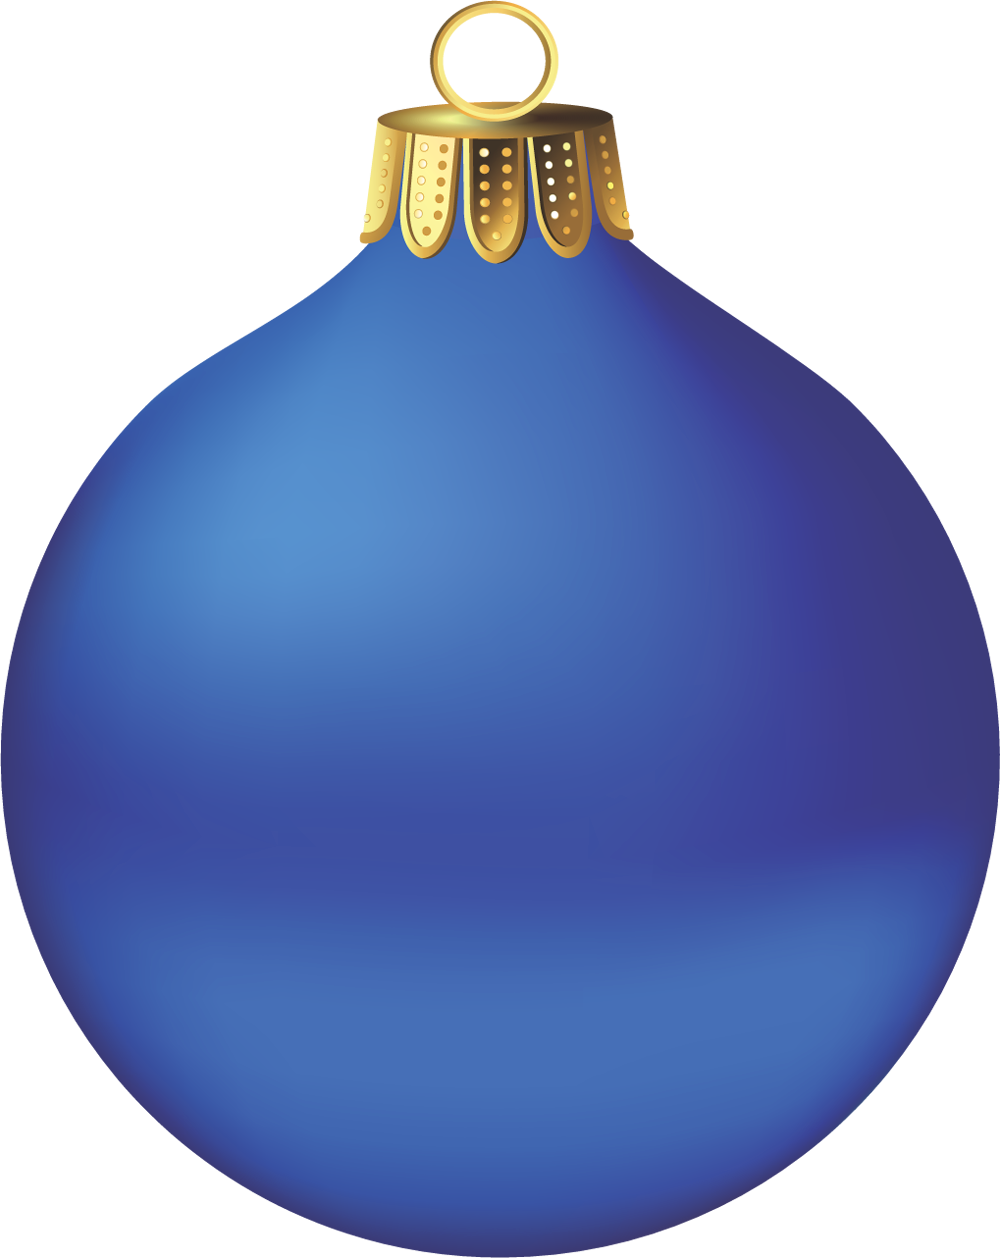 Christmas Ornament Border Clipart | Clipart Panda - Free ...